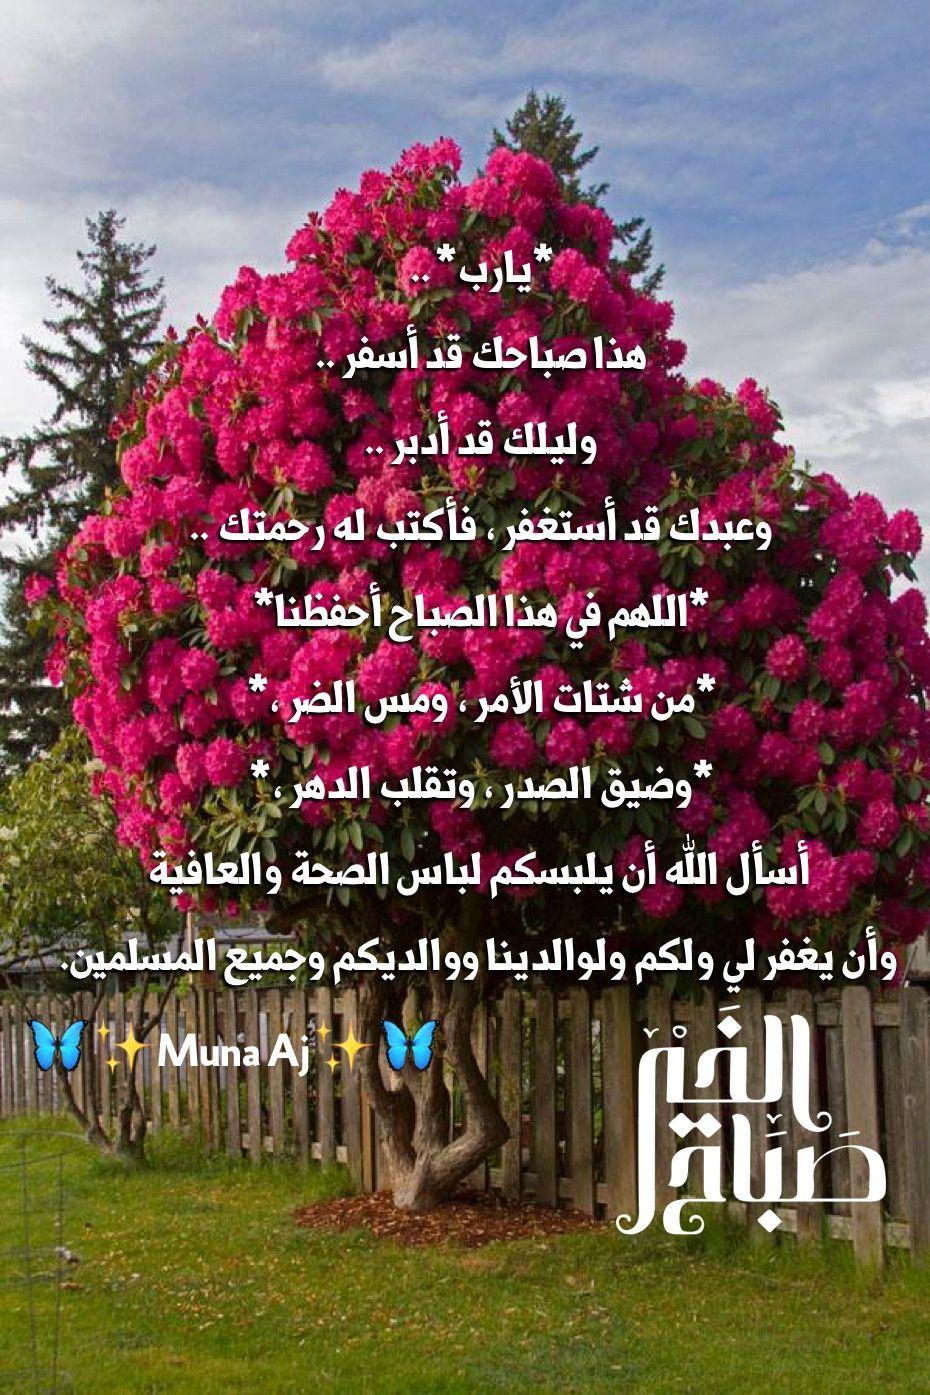 Pin By Queen Roses On صباح ومساء الخير اقتباسات جميله Islamic Love Quotes Romantic Love Quotes Islamic Wallpaper